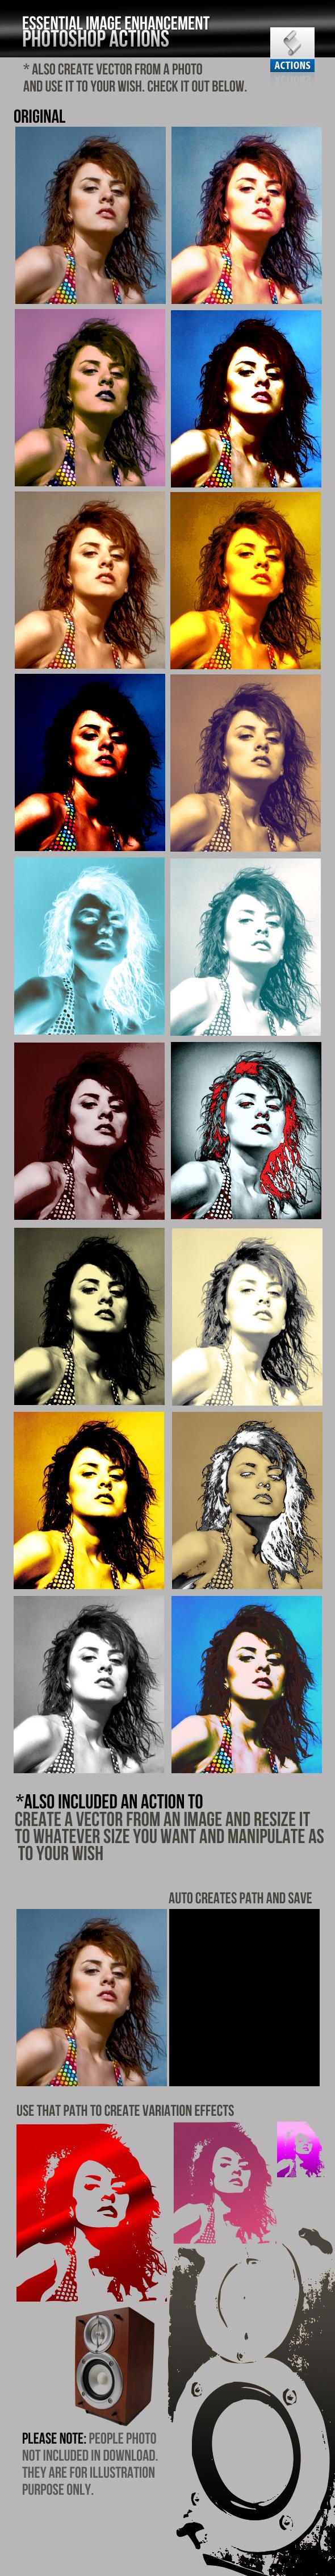 Image Enhancement / Manipulation Photoshop Actions - Photoshop Add-ons